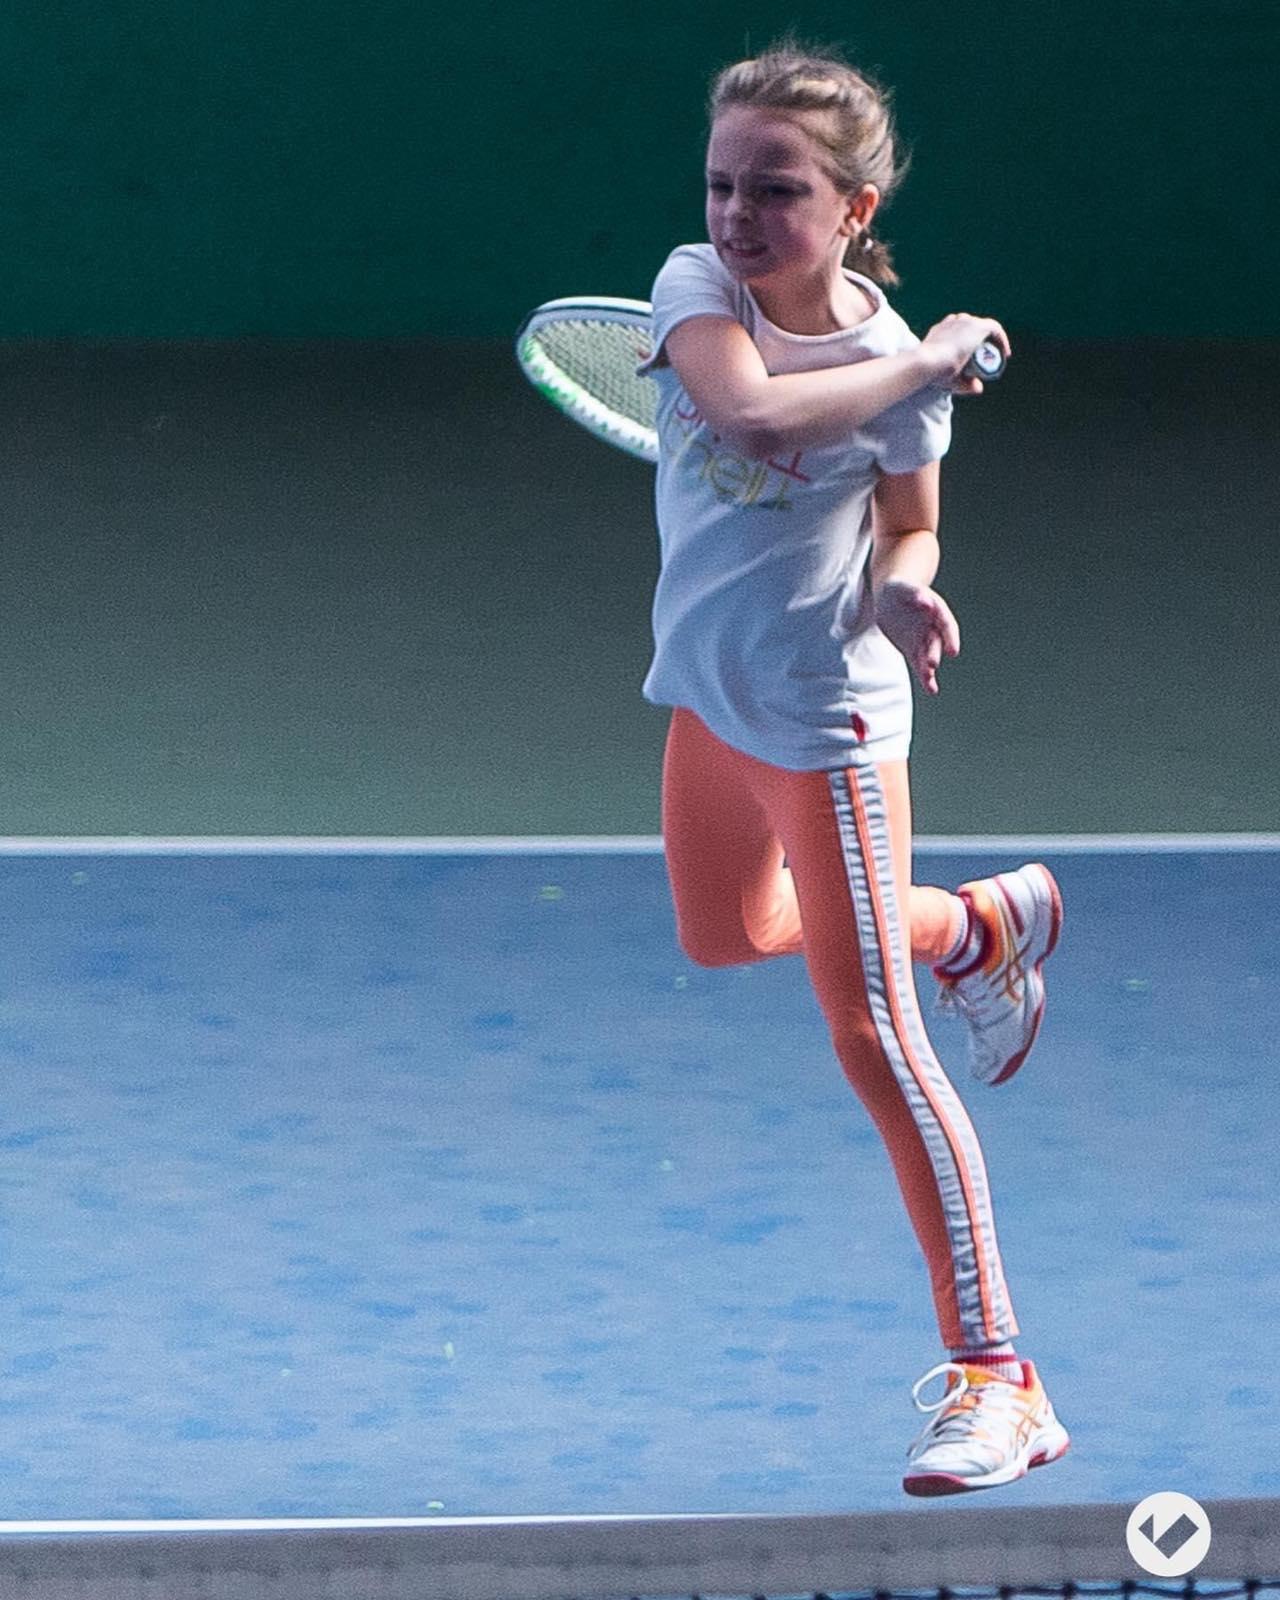 Mala teniserka Andrea Popović, Teniski klub Vojvodina Novi Sad